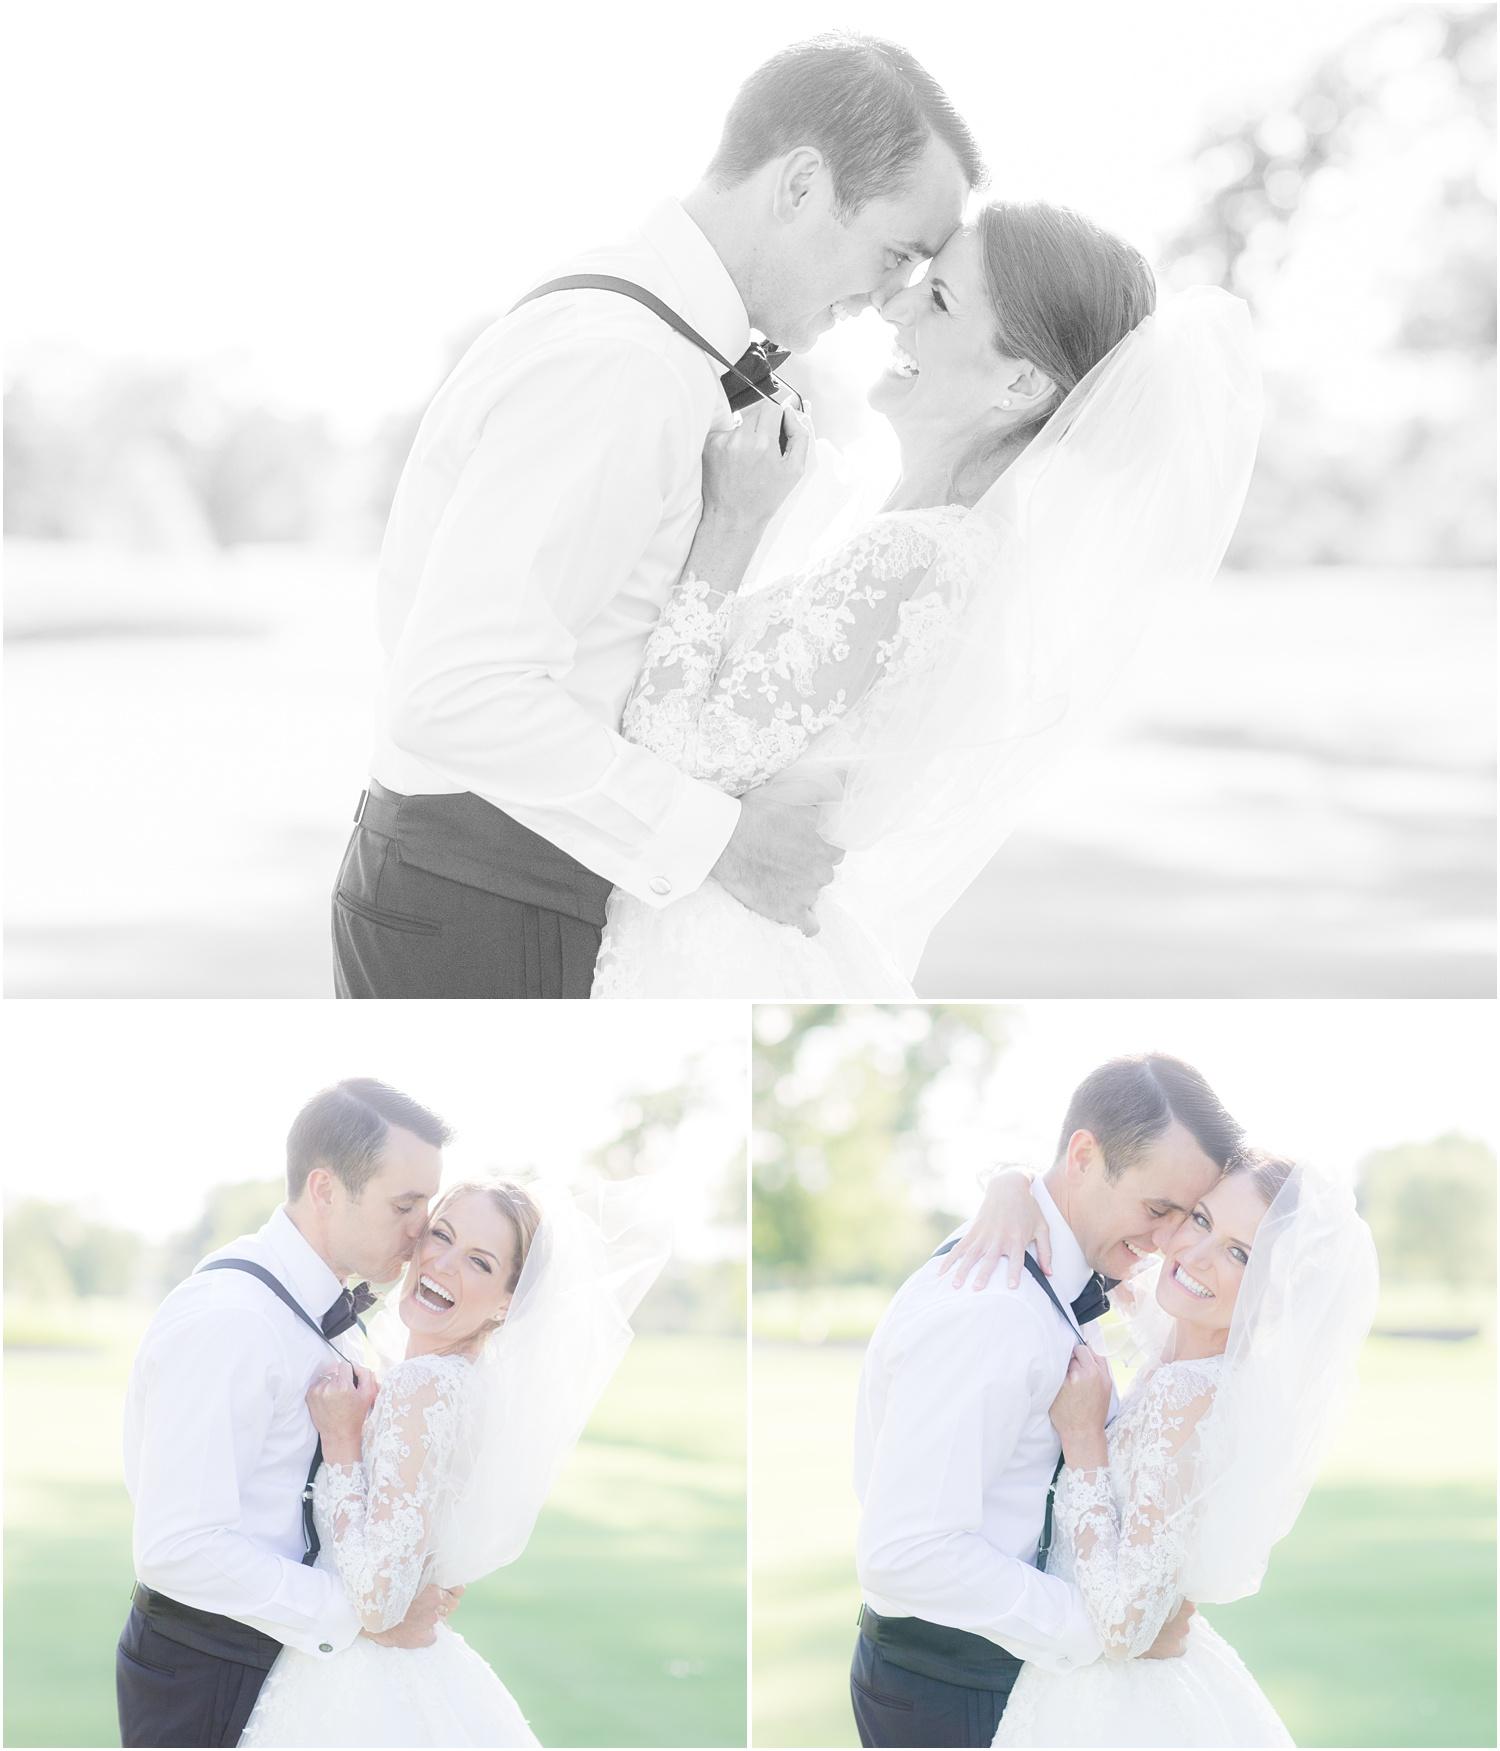 fun and romantic wedding photos at Canoe Brook Country Club